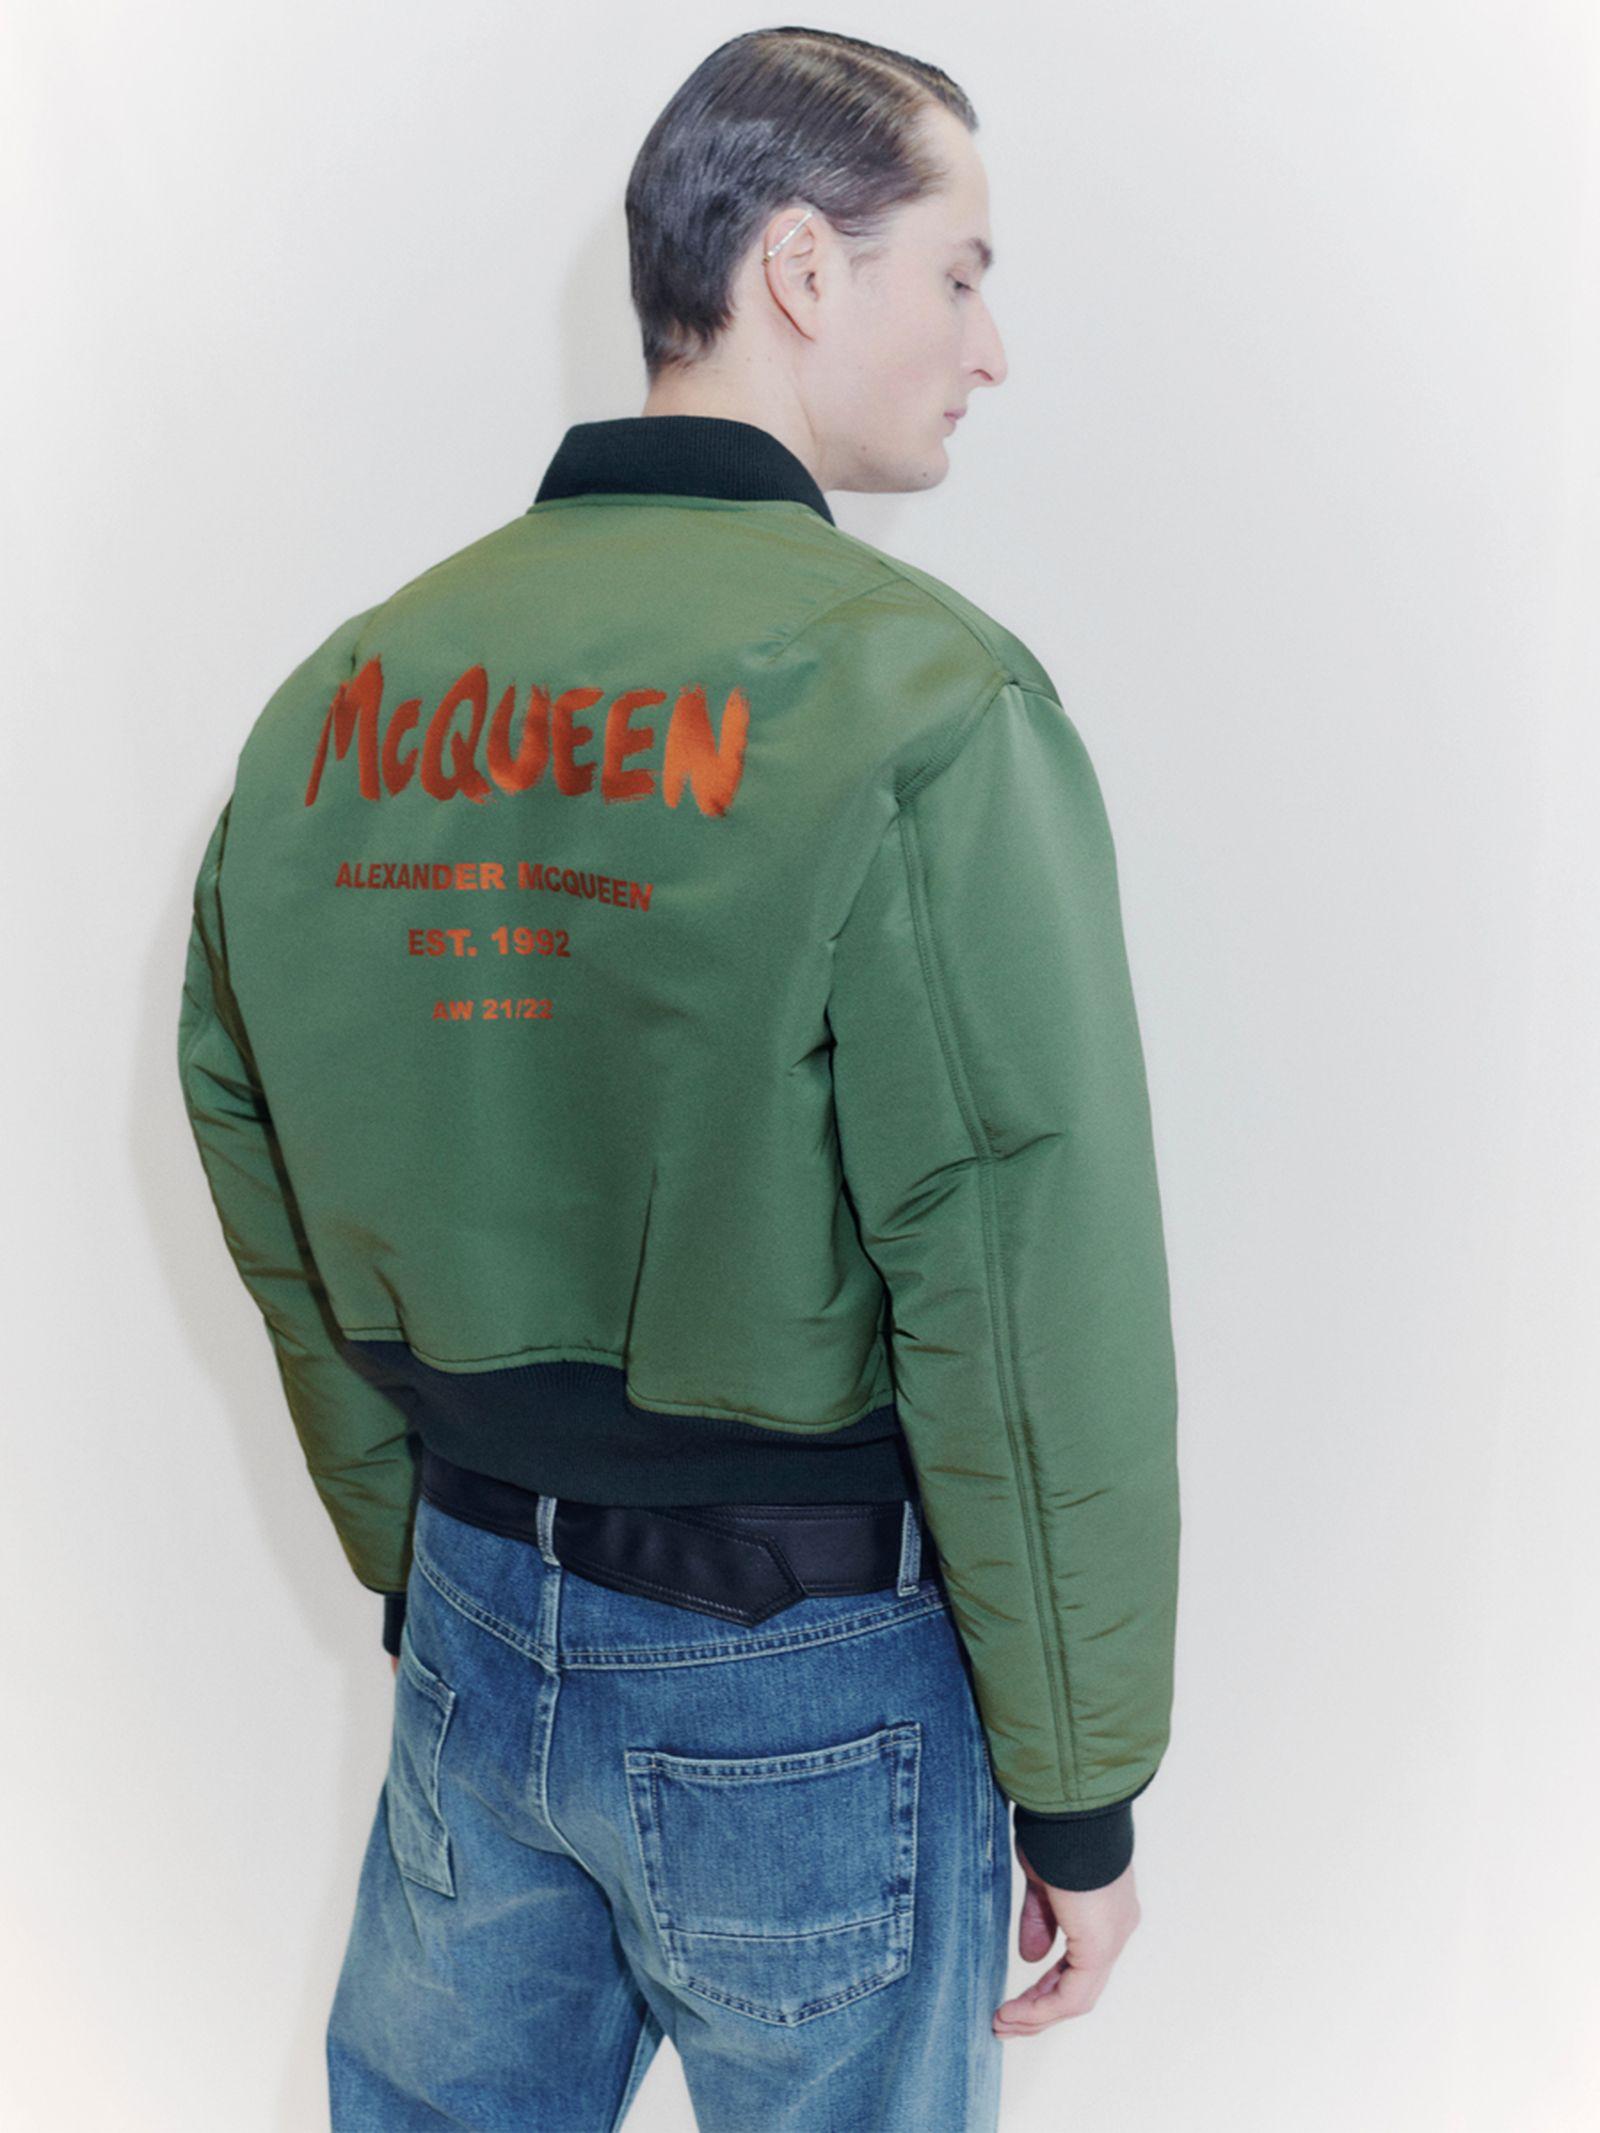 alexander-mcqueen-fall-winter-2021-collection- (5)